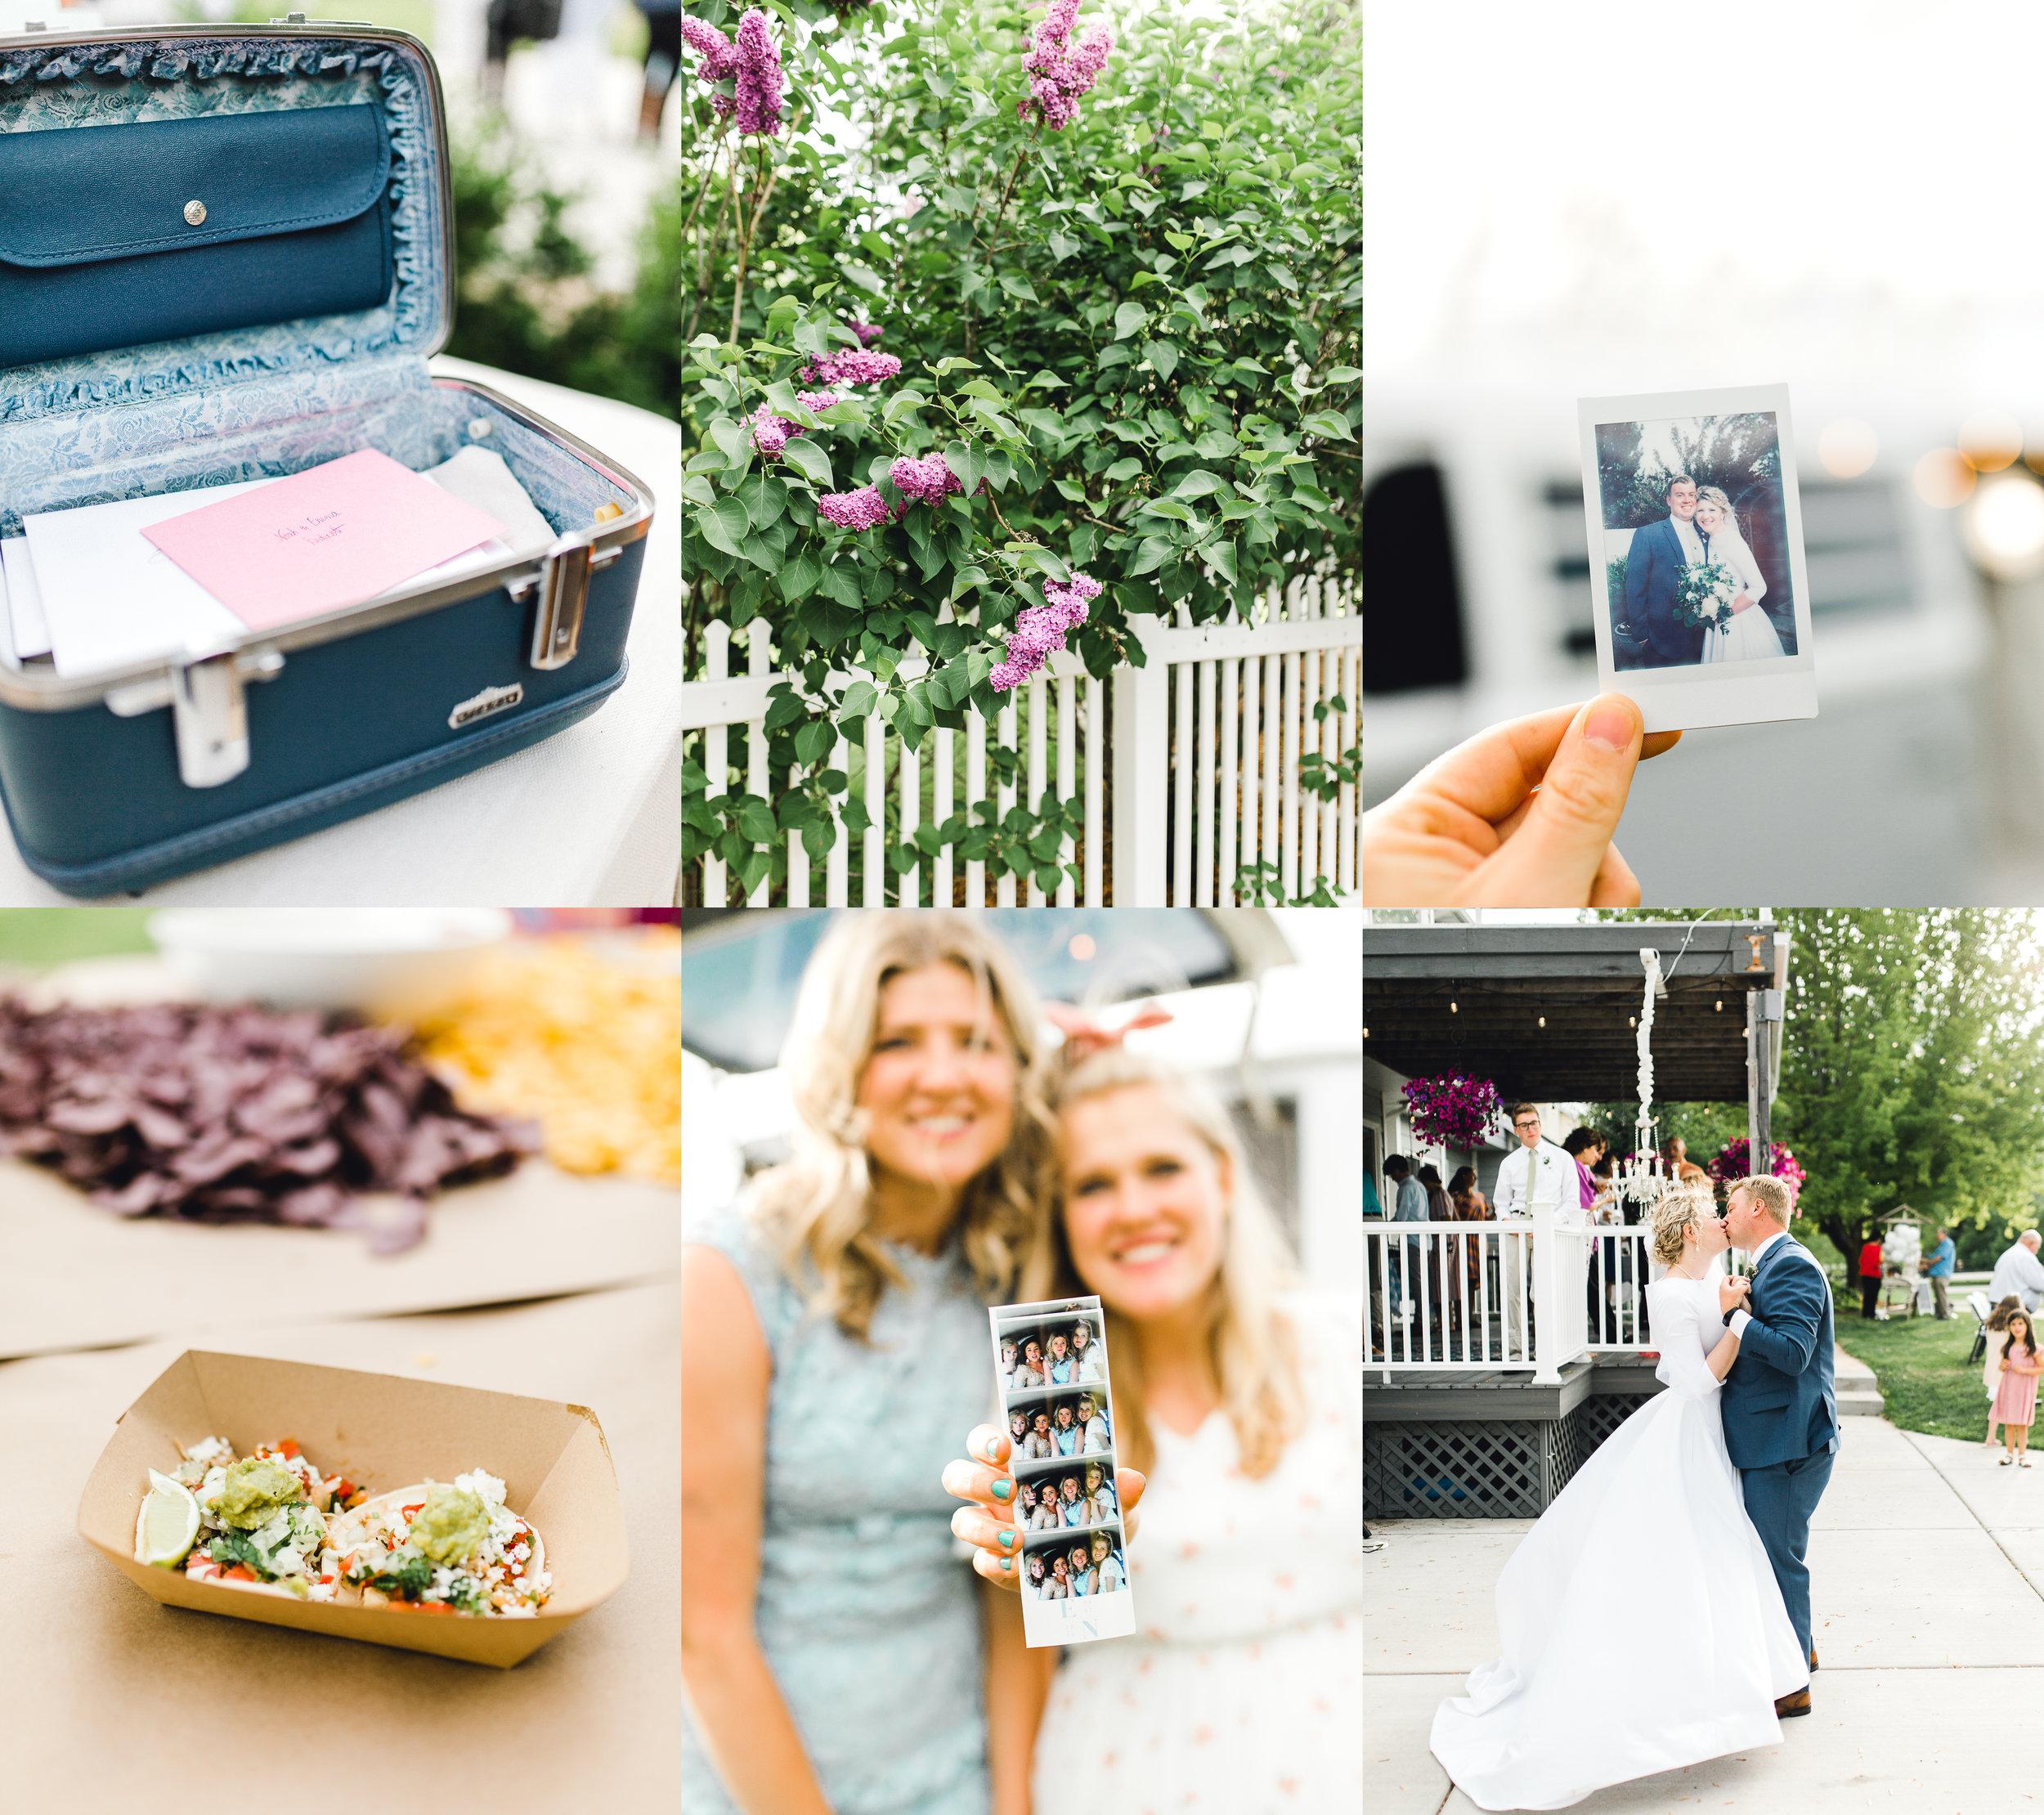 beautiful-outdoor-backyard-wedding-reception-anna-christine-photography-rexburg-idaho-15.jpg